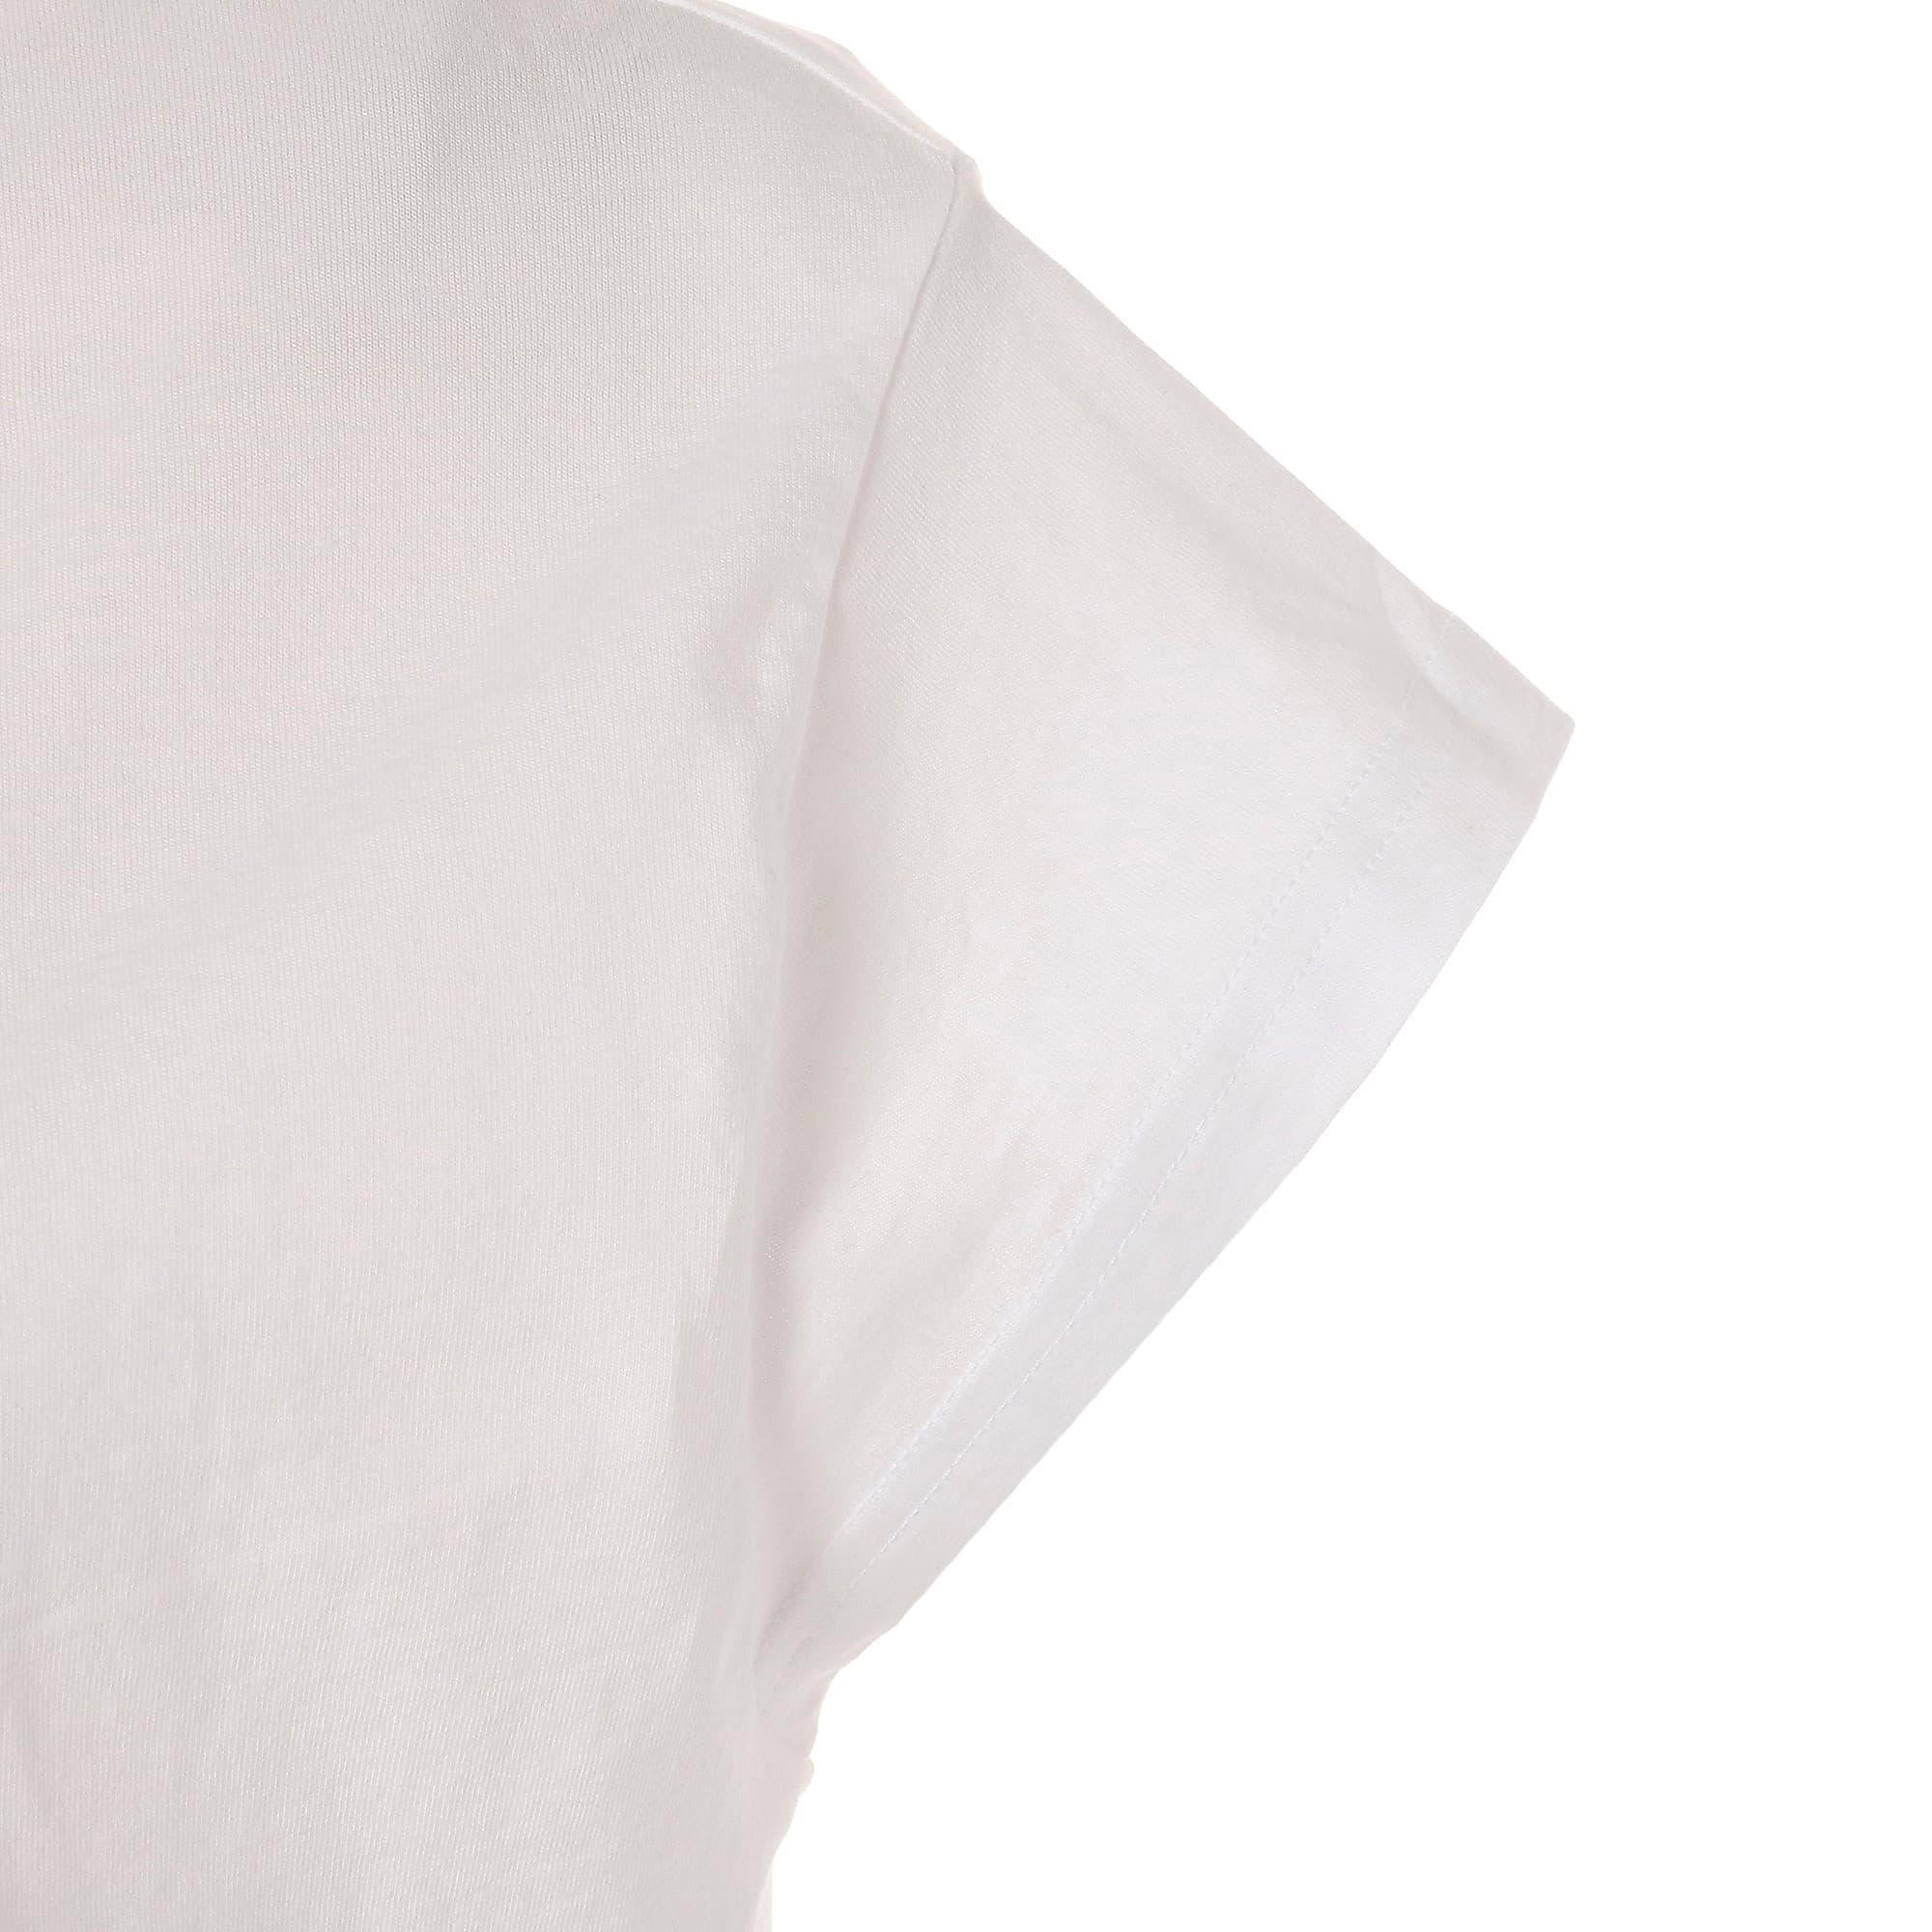 Thumbnail 7 of PUMA XTG グラフィック ウィメンズ SS Tシャツ 半袖, Puma White, medium-JPN